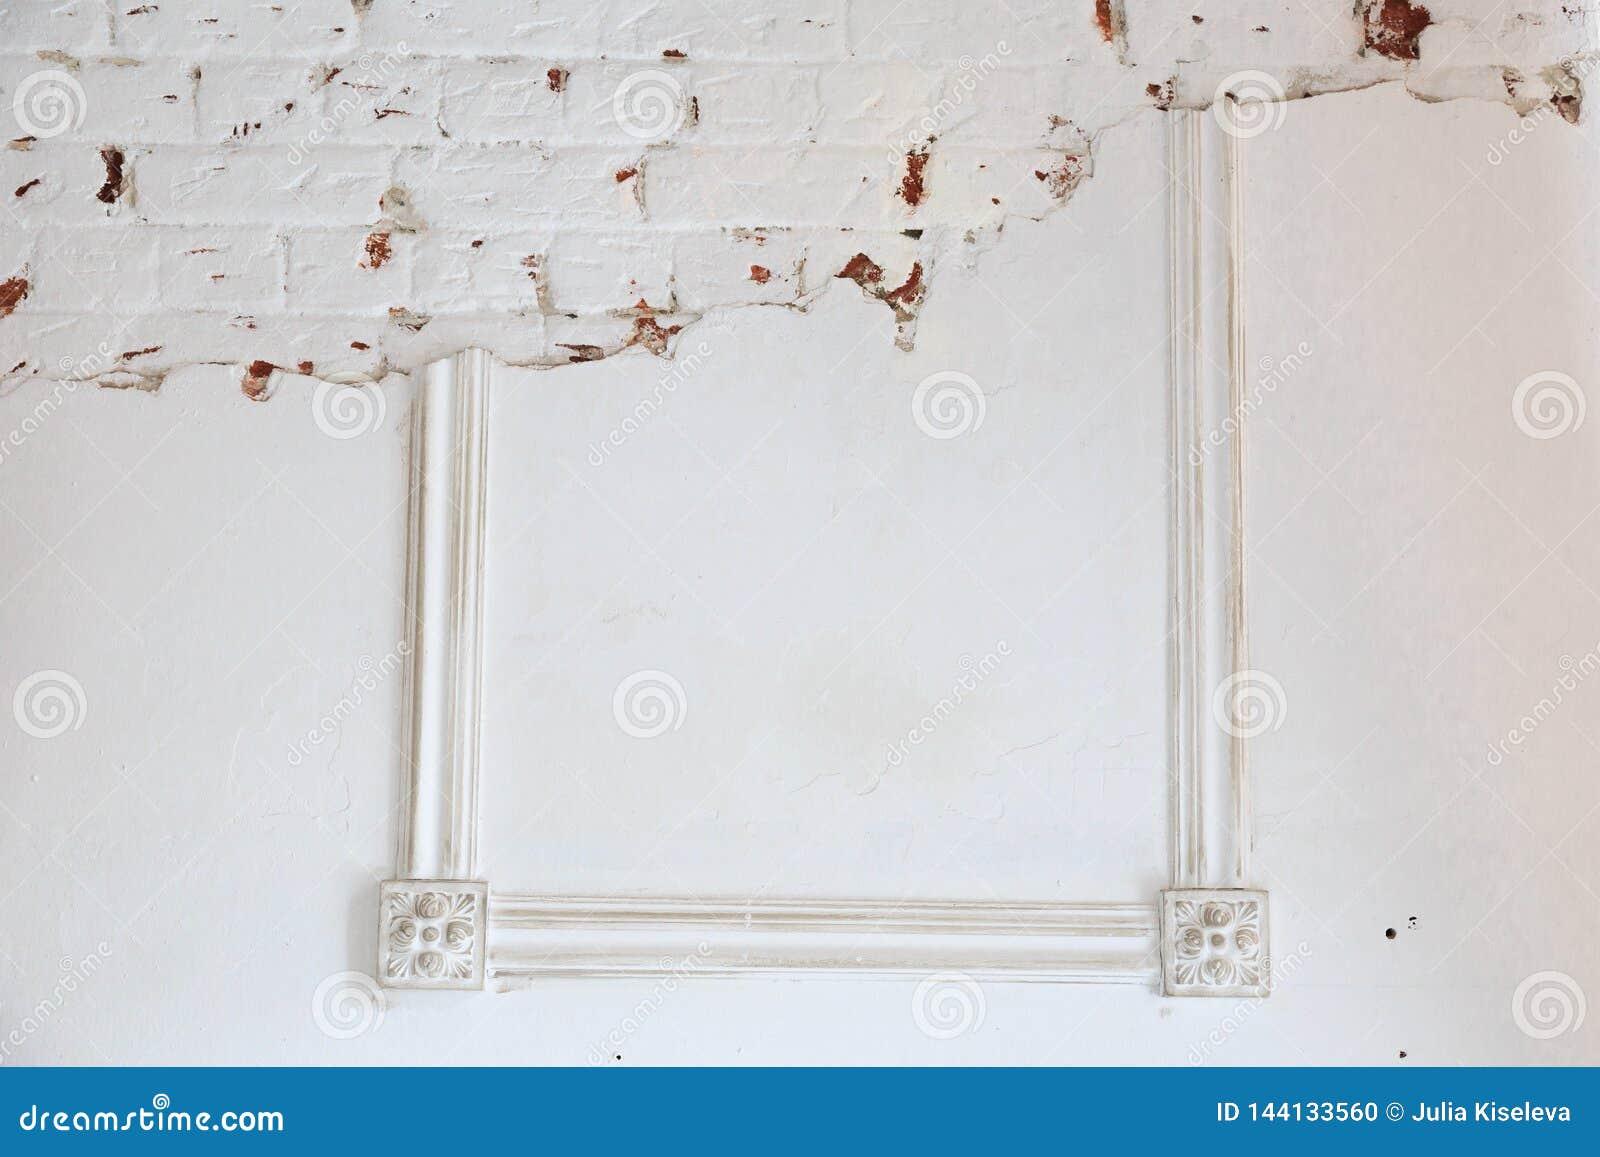 Blank frame on white wall  stock photo  Image of cake